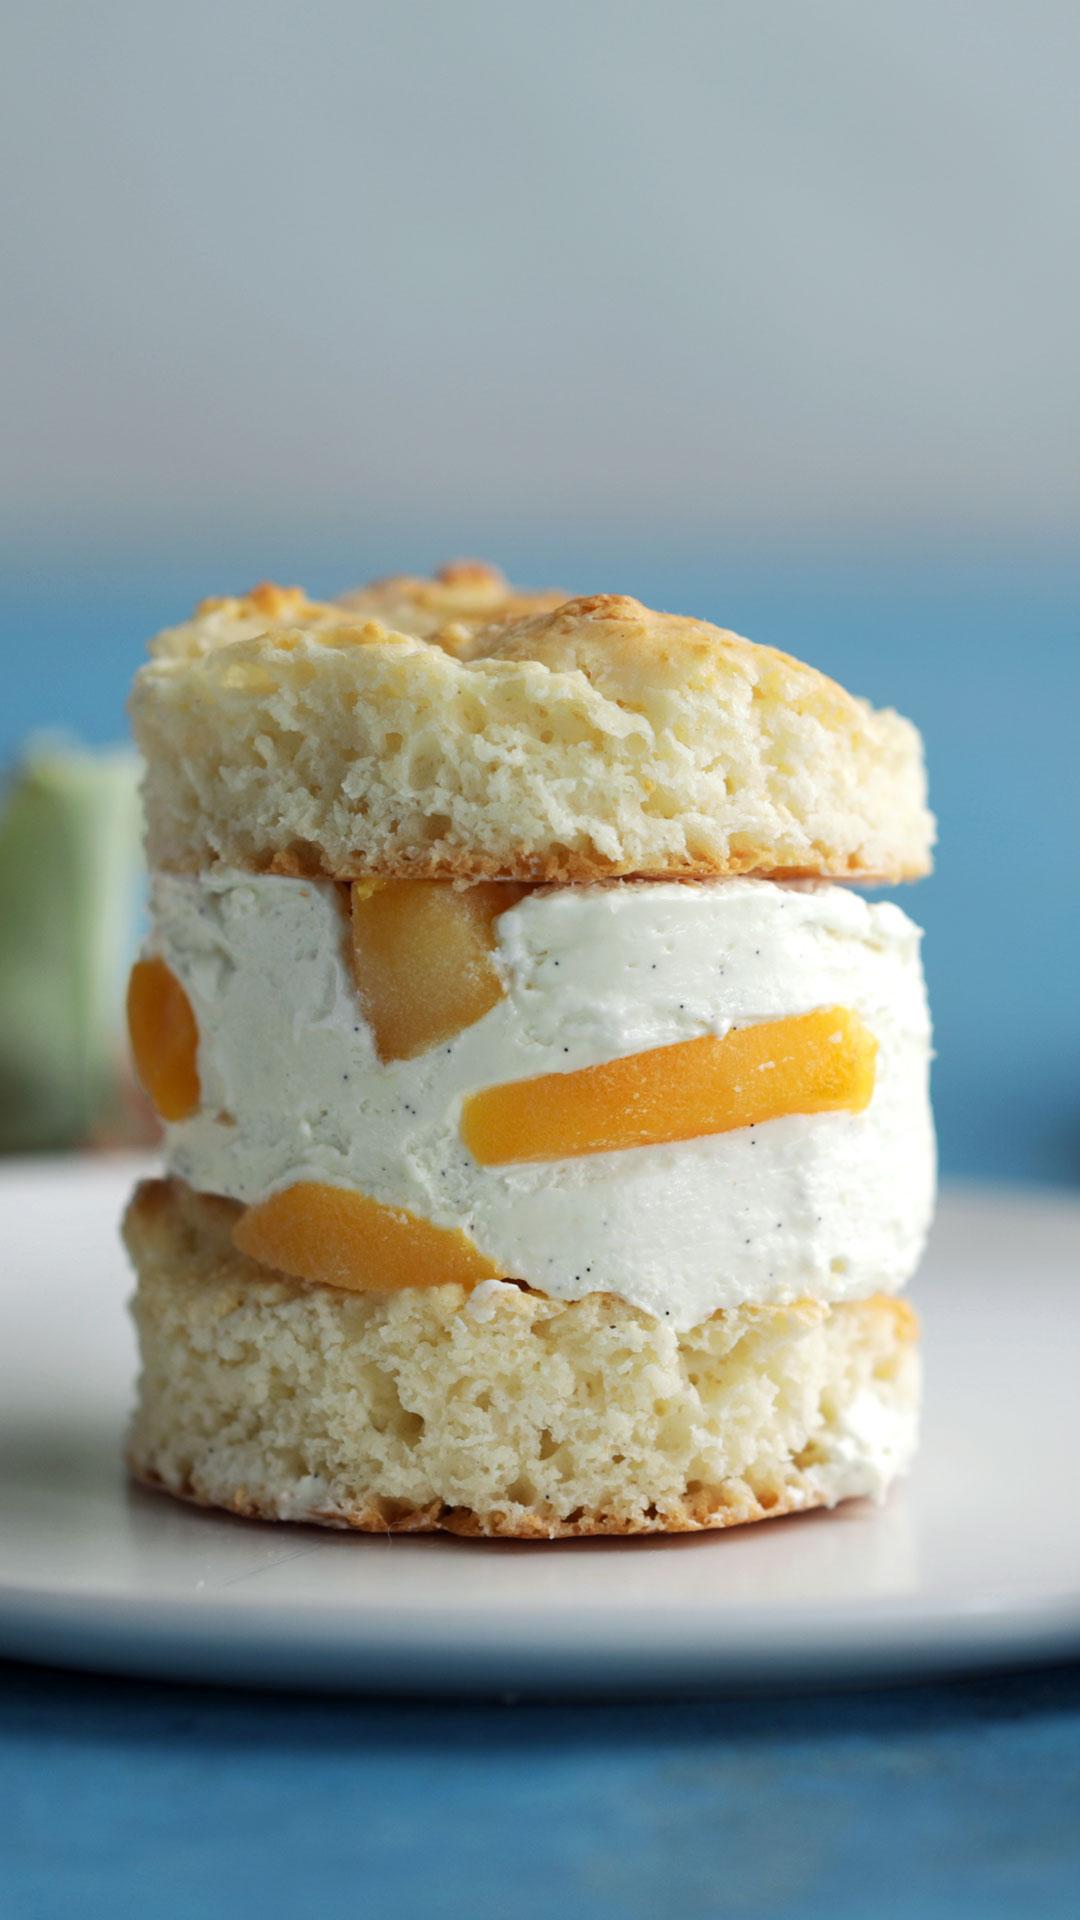 Peach Shortcake Ice Cream Sandwiches